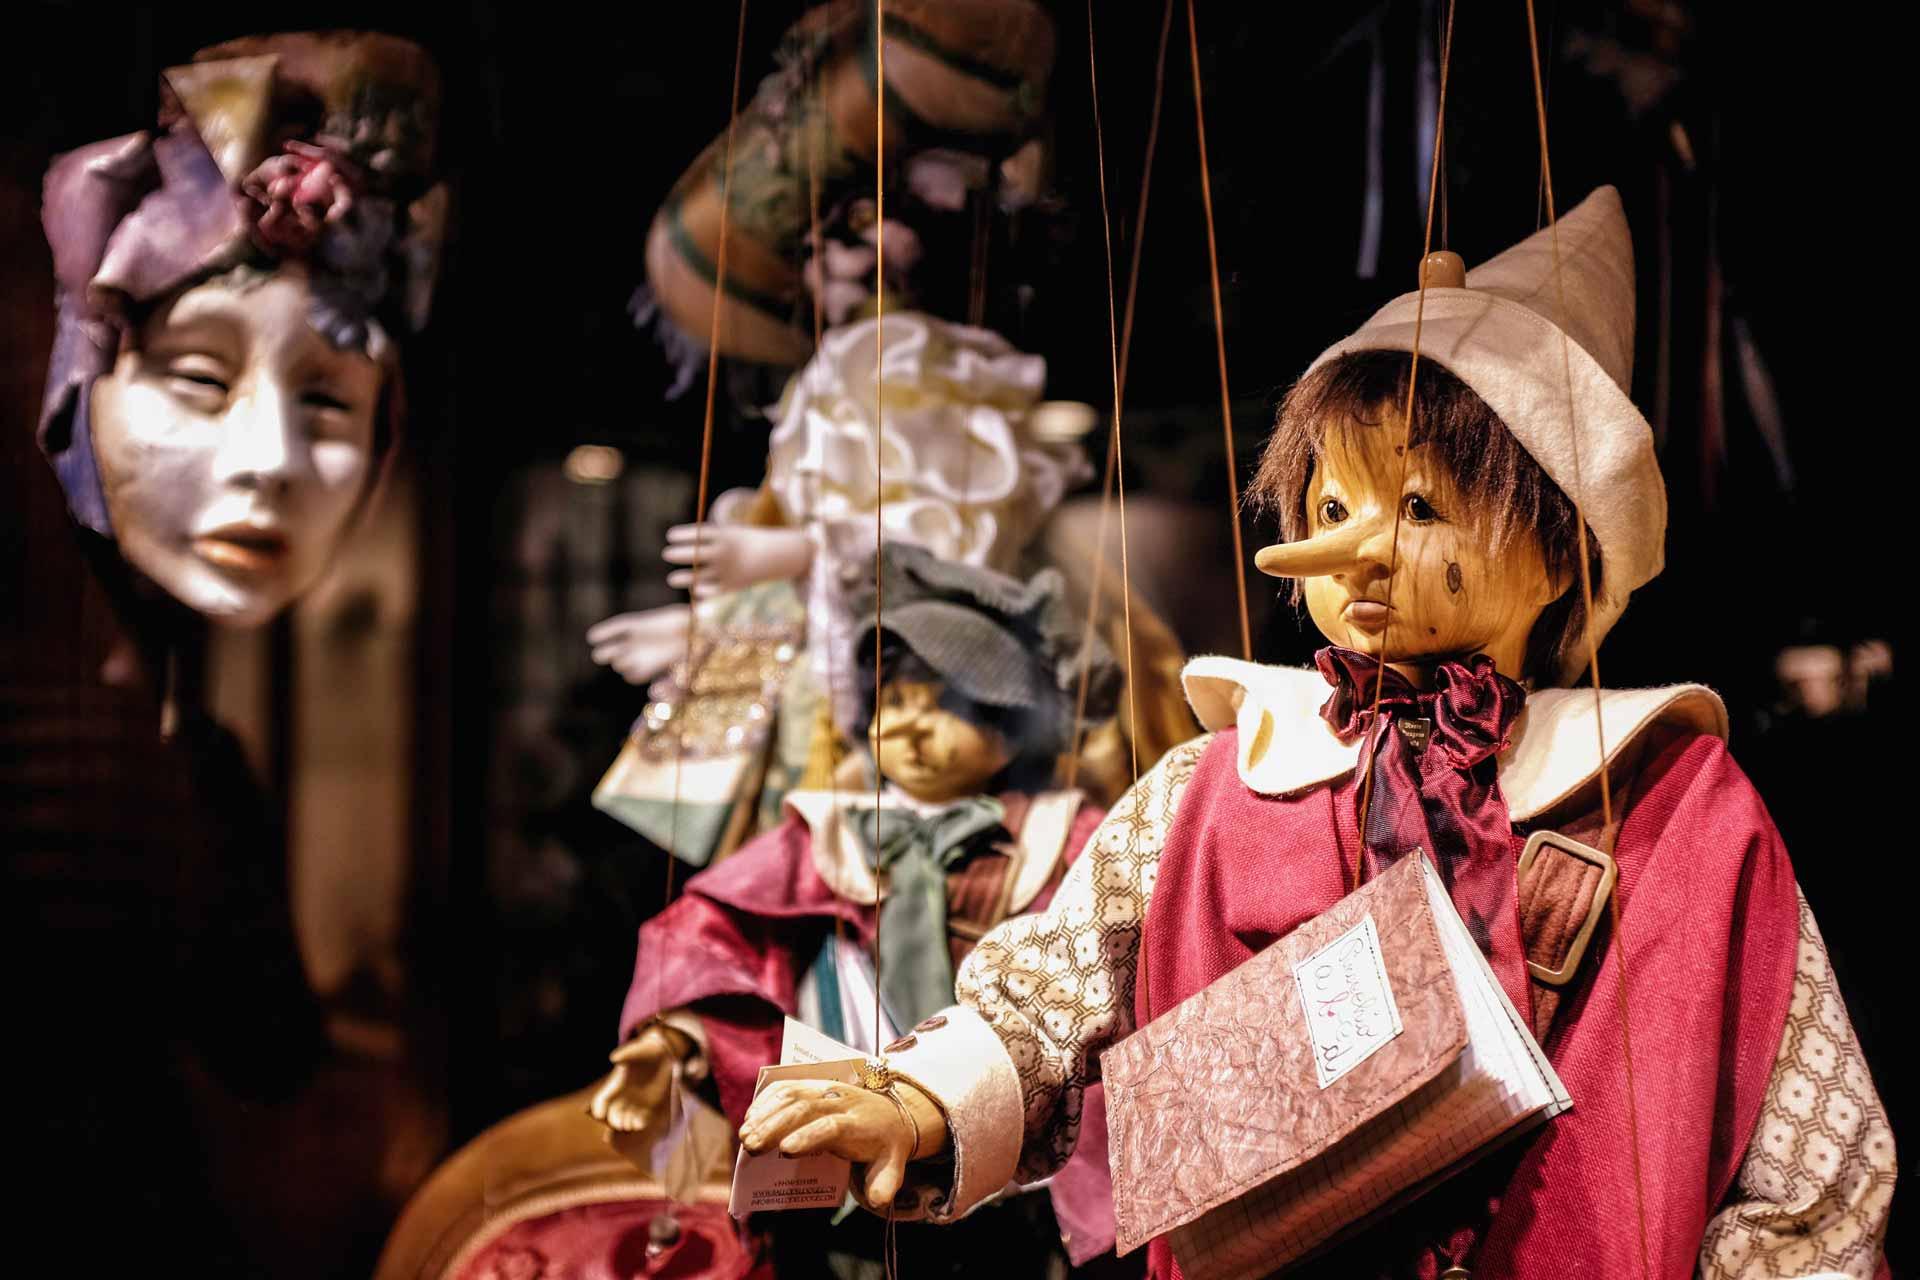 Pinocchio marionette Venice Italy